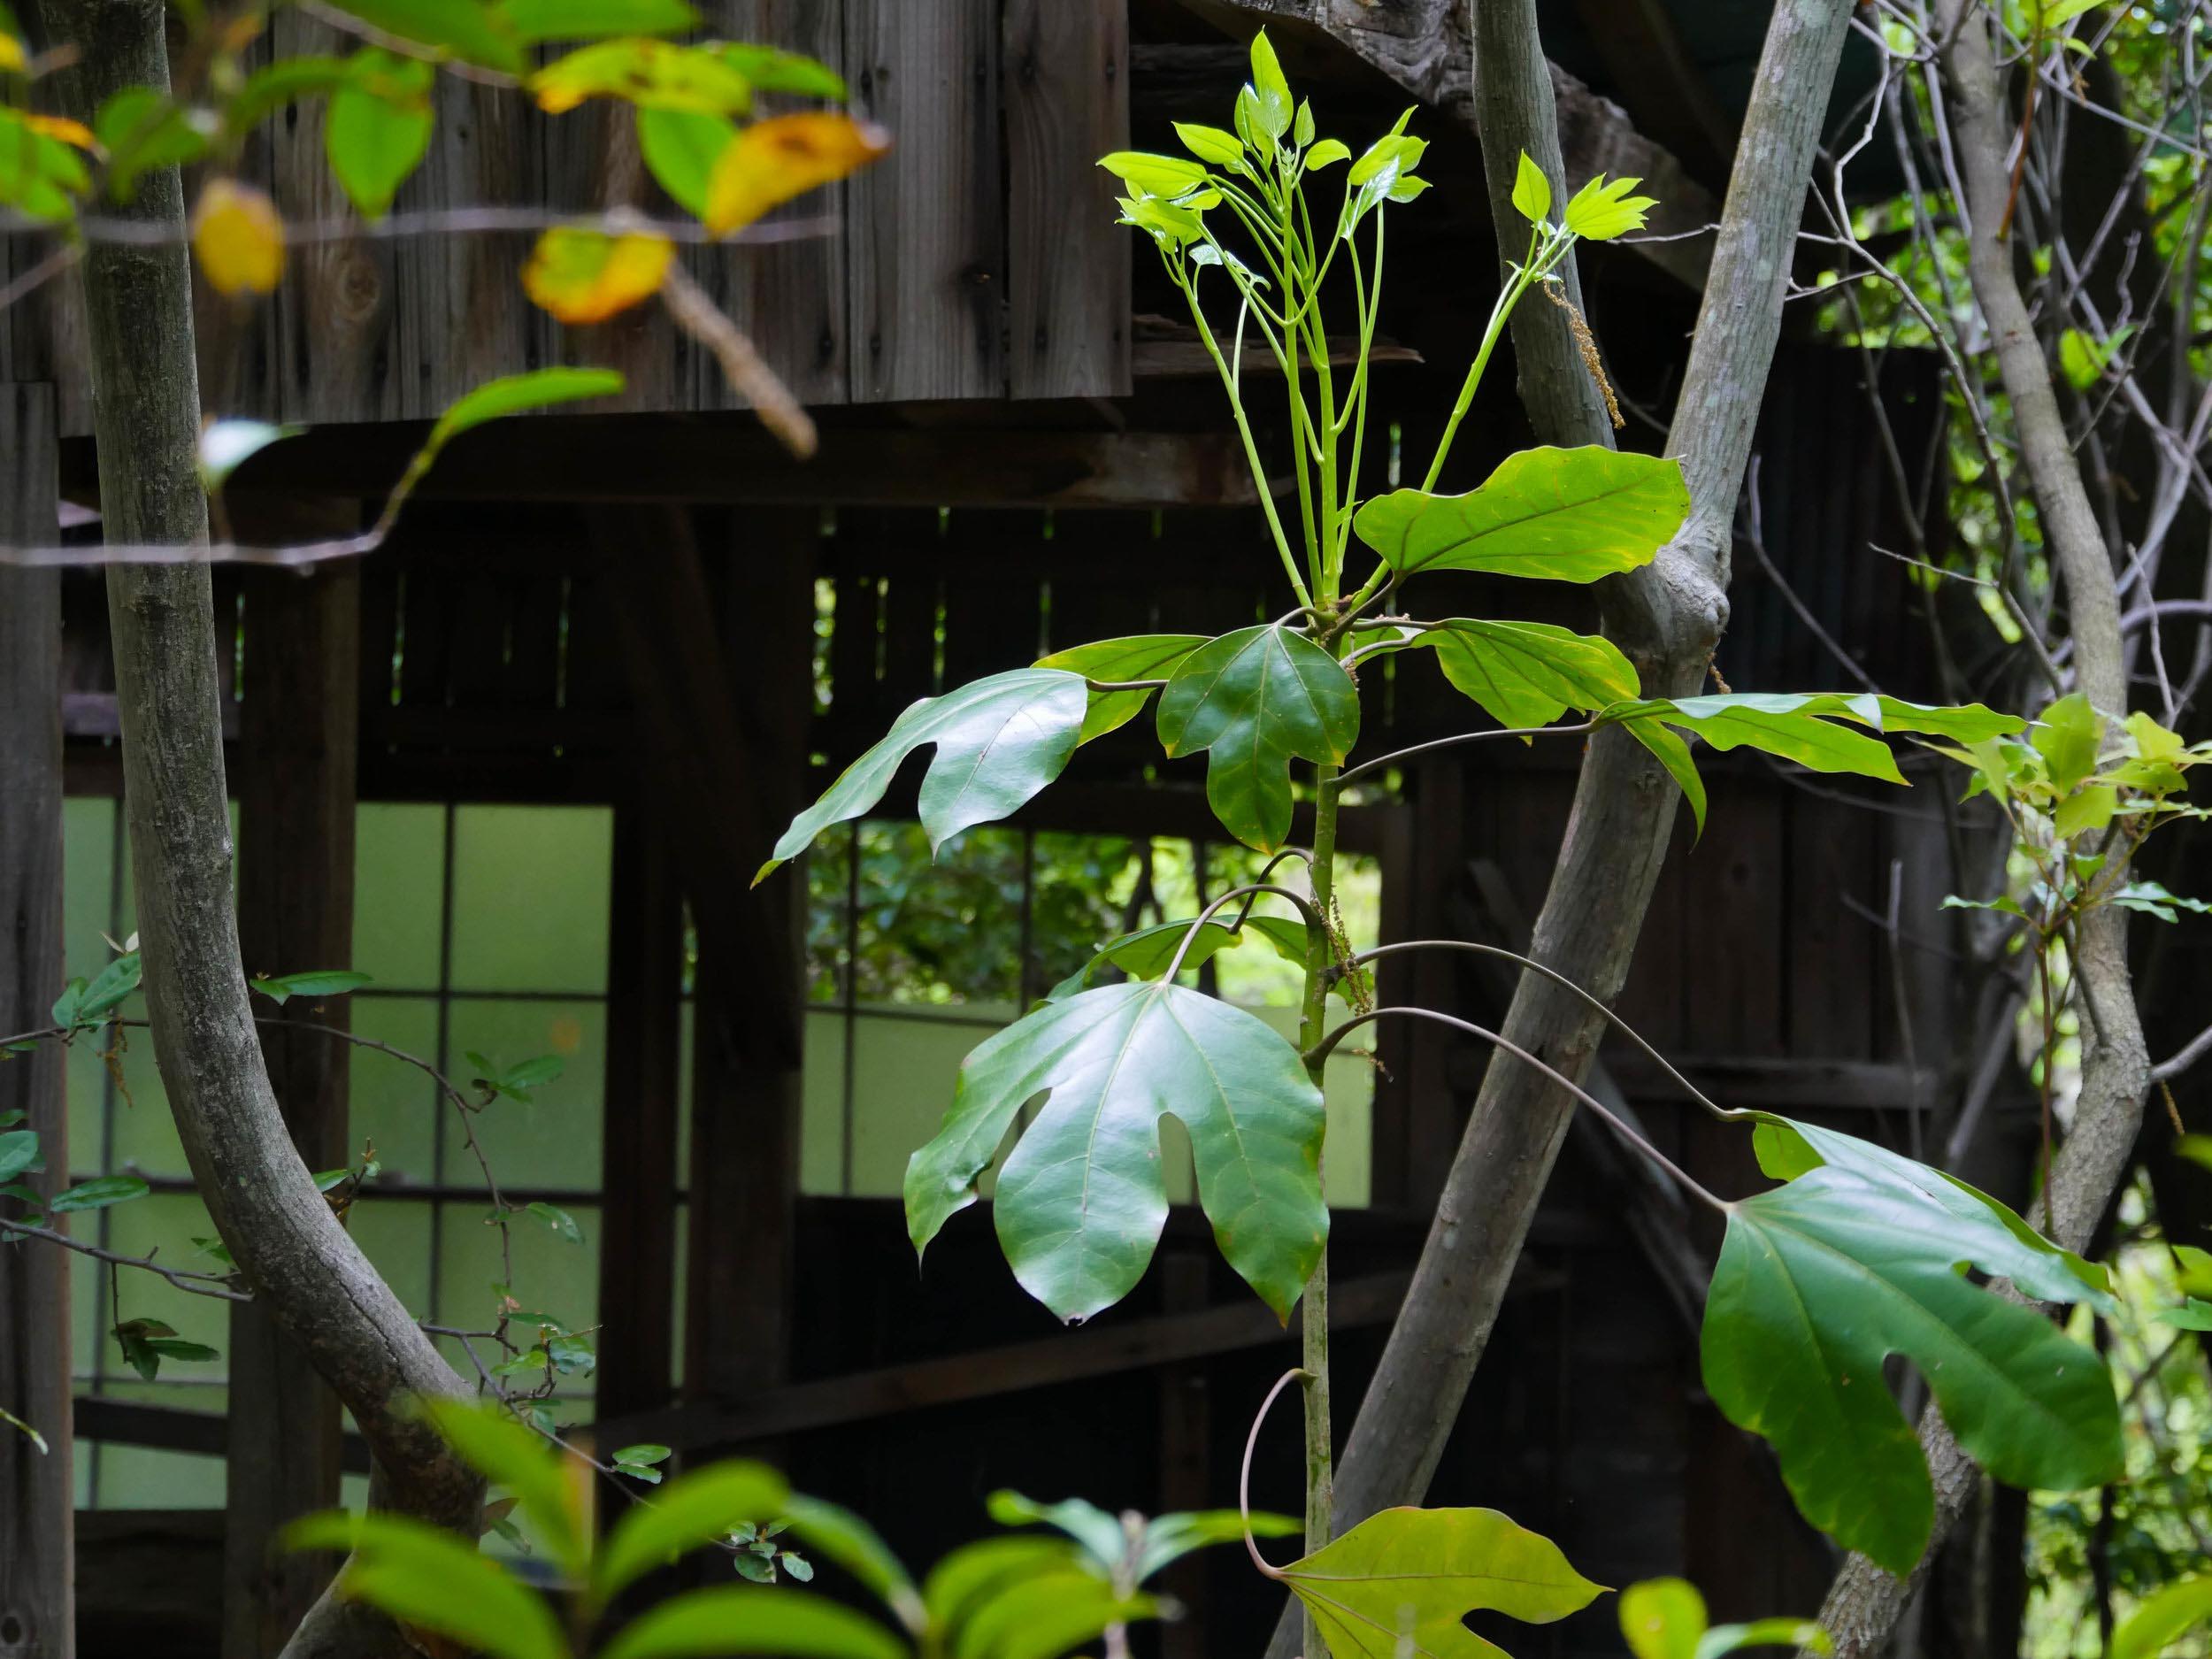 matsuyama-dougo-onsen-37.jpg